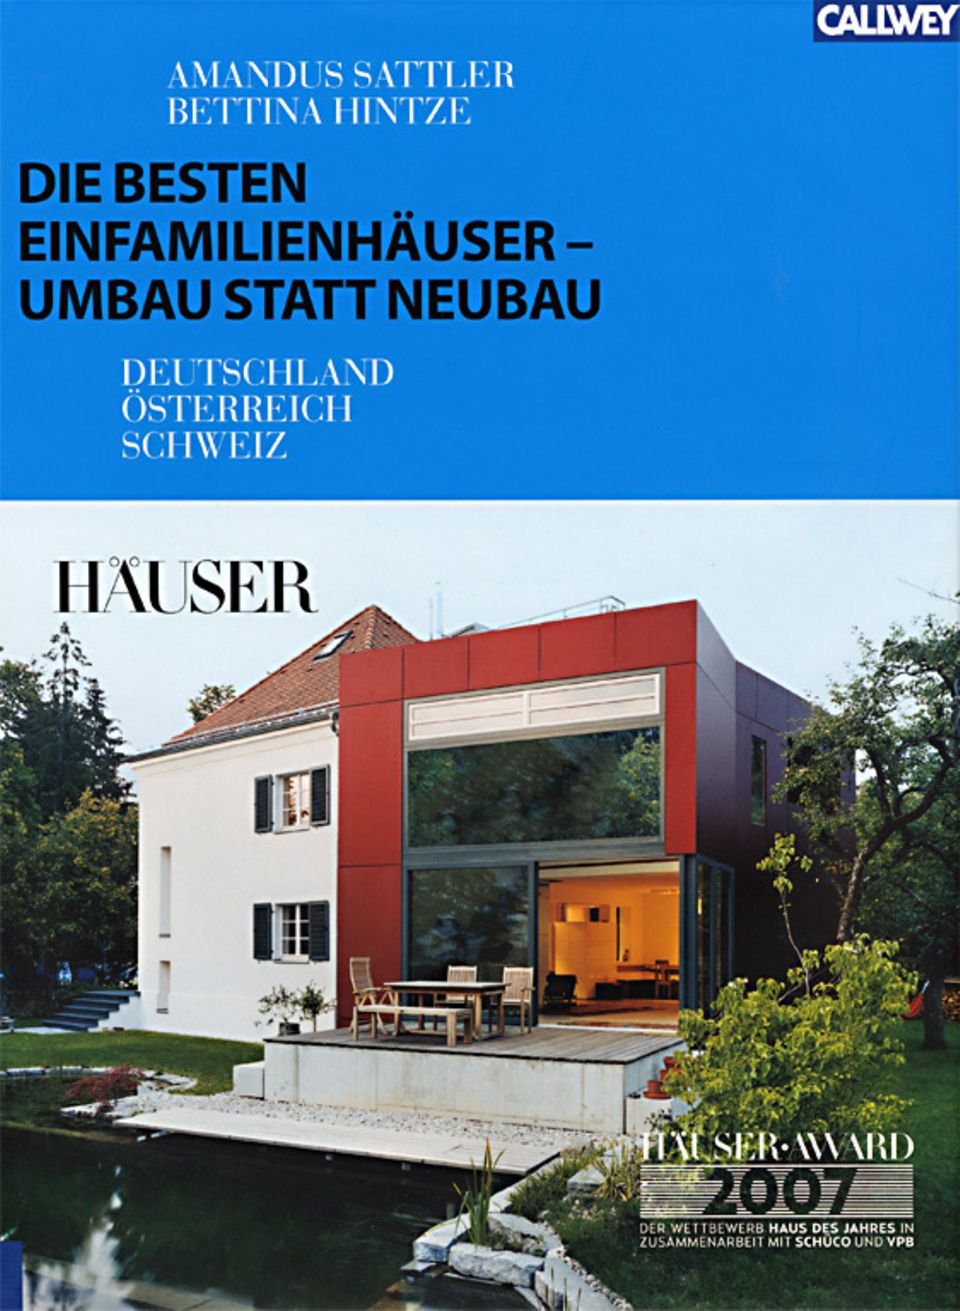 HÄUSER-AWARD 2007: Umbauen statt Neubauen